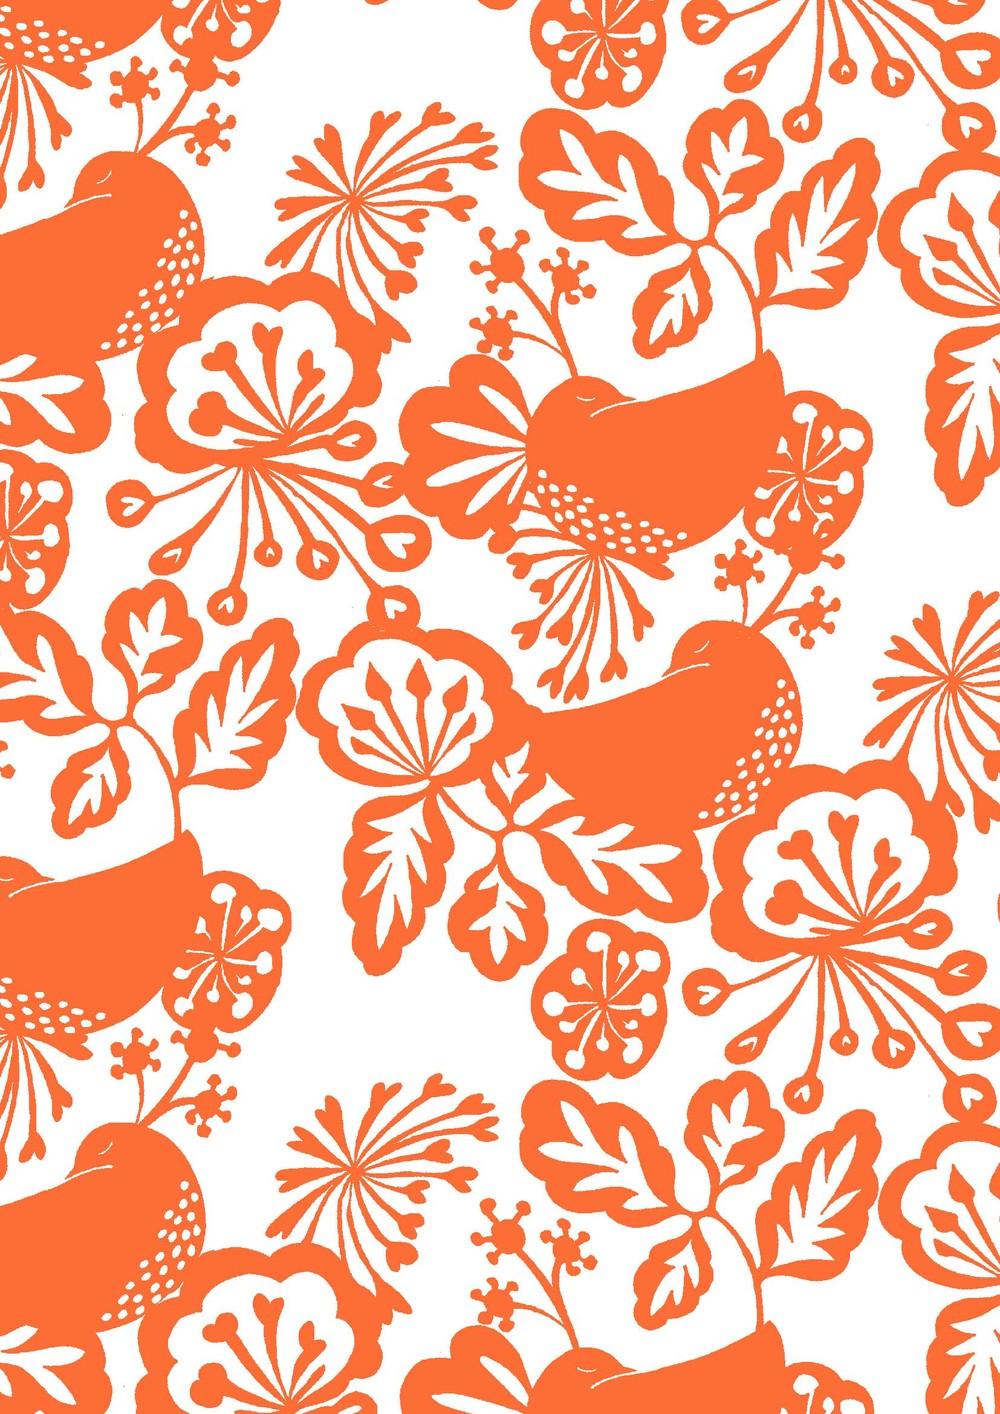 Orange birds